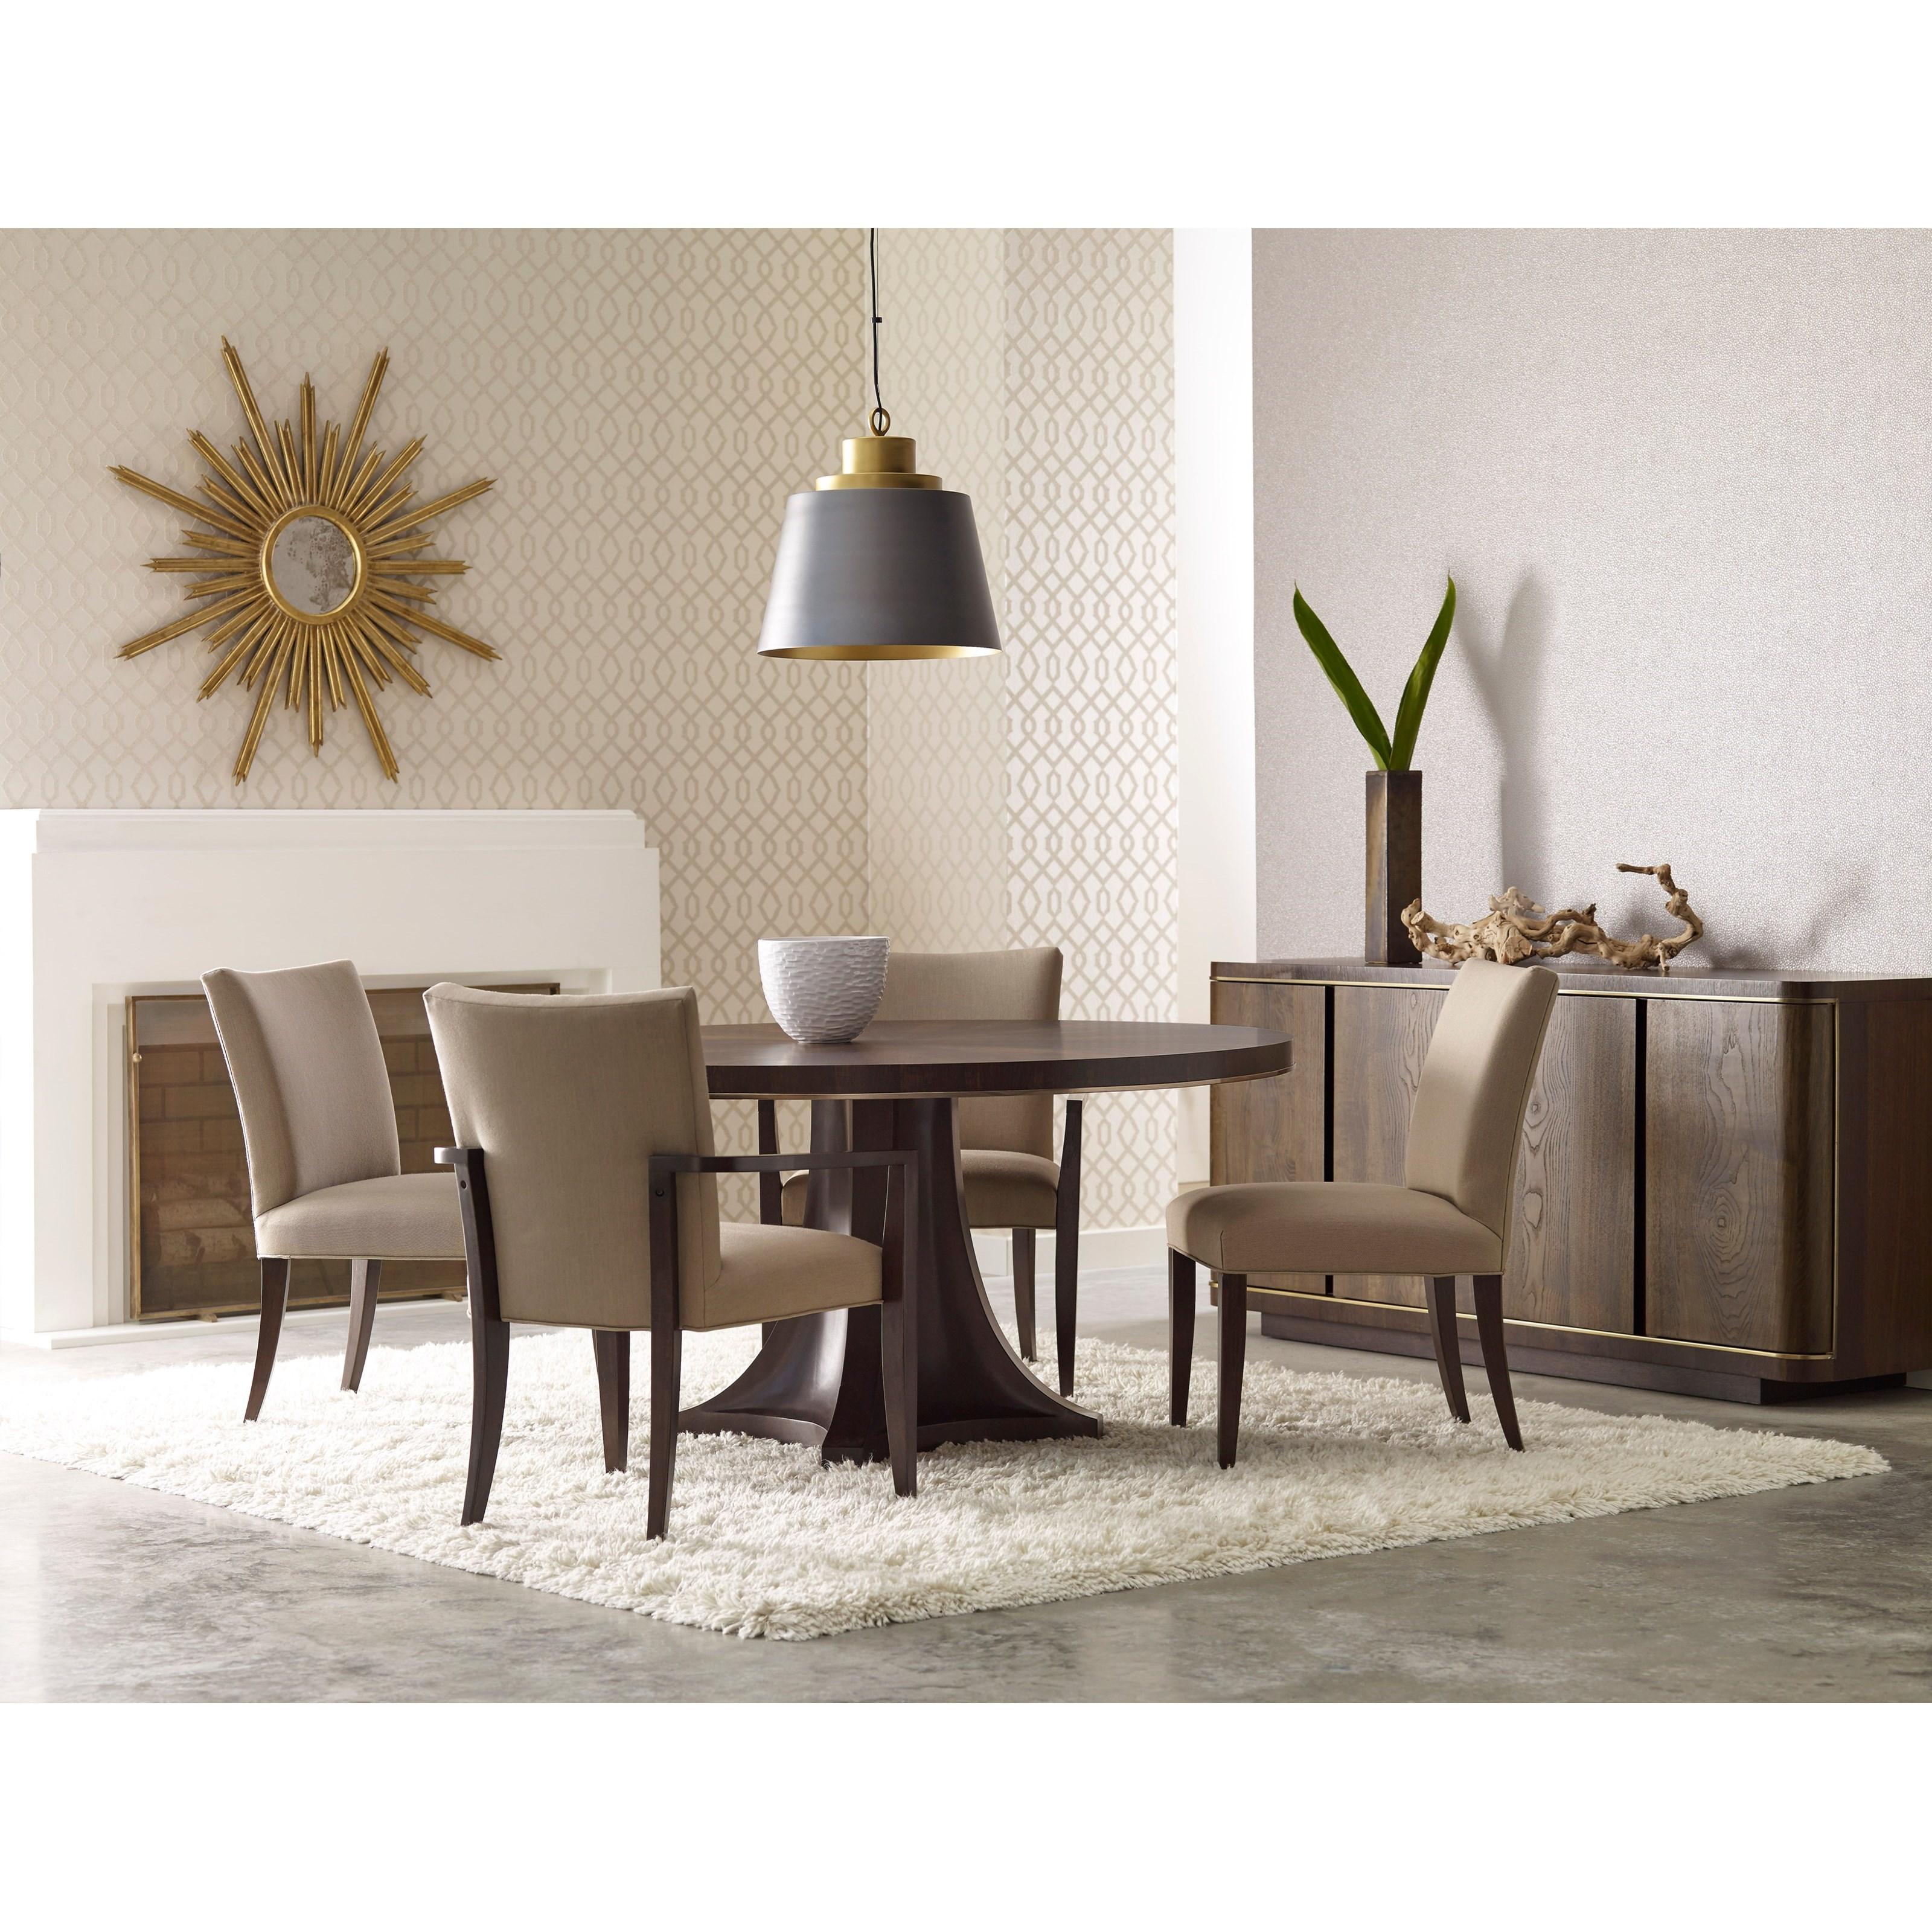 American Drew Ad Modern Organics Camby Round Pedestal Dining Table